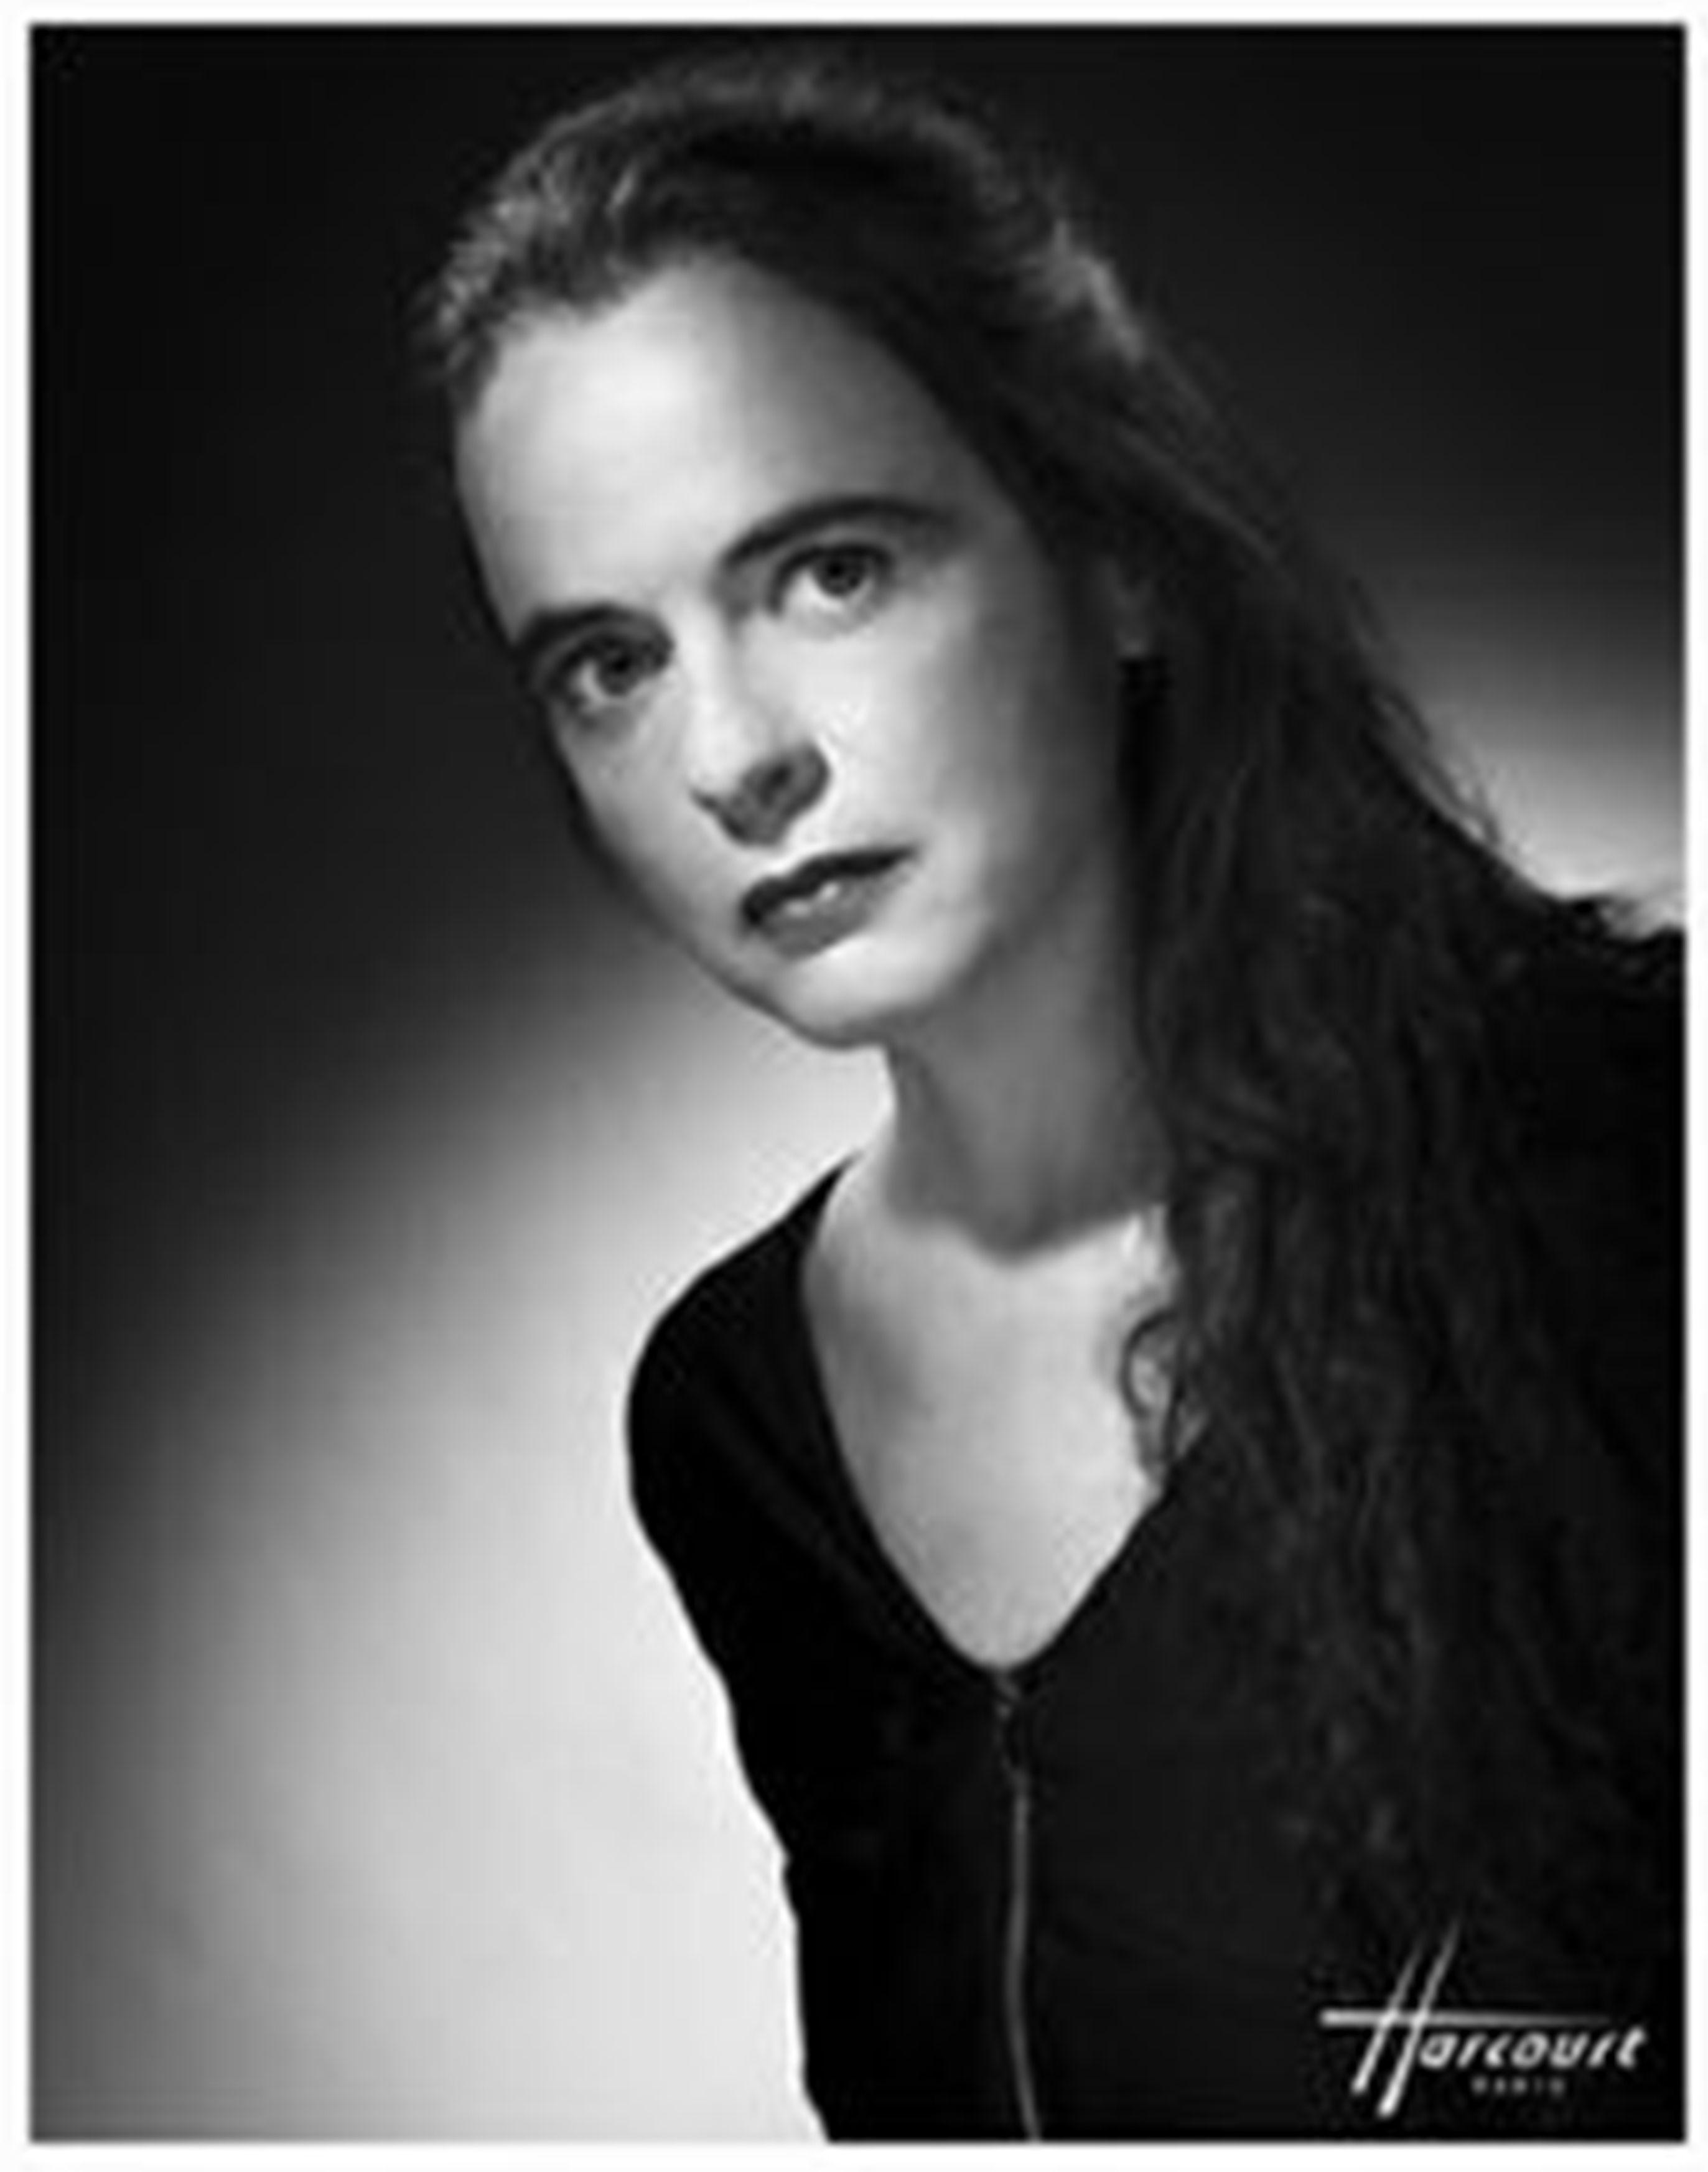 amelie nothomb- christian mcmanus